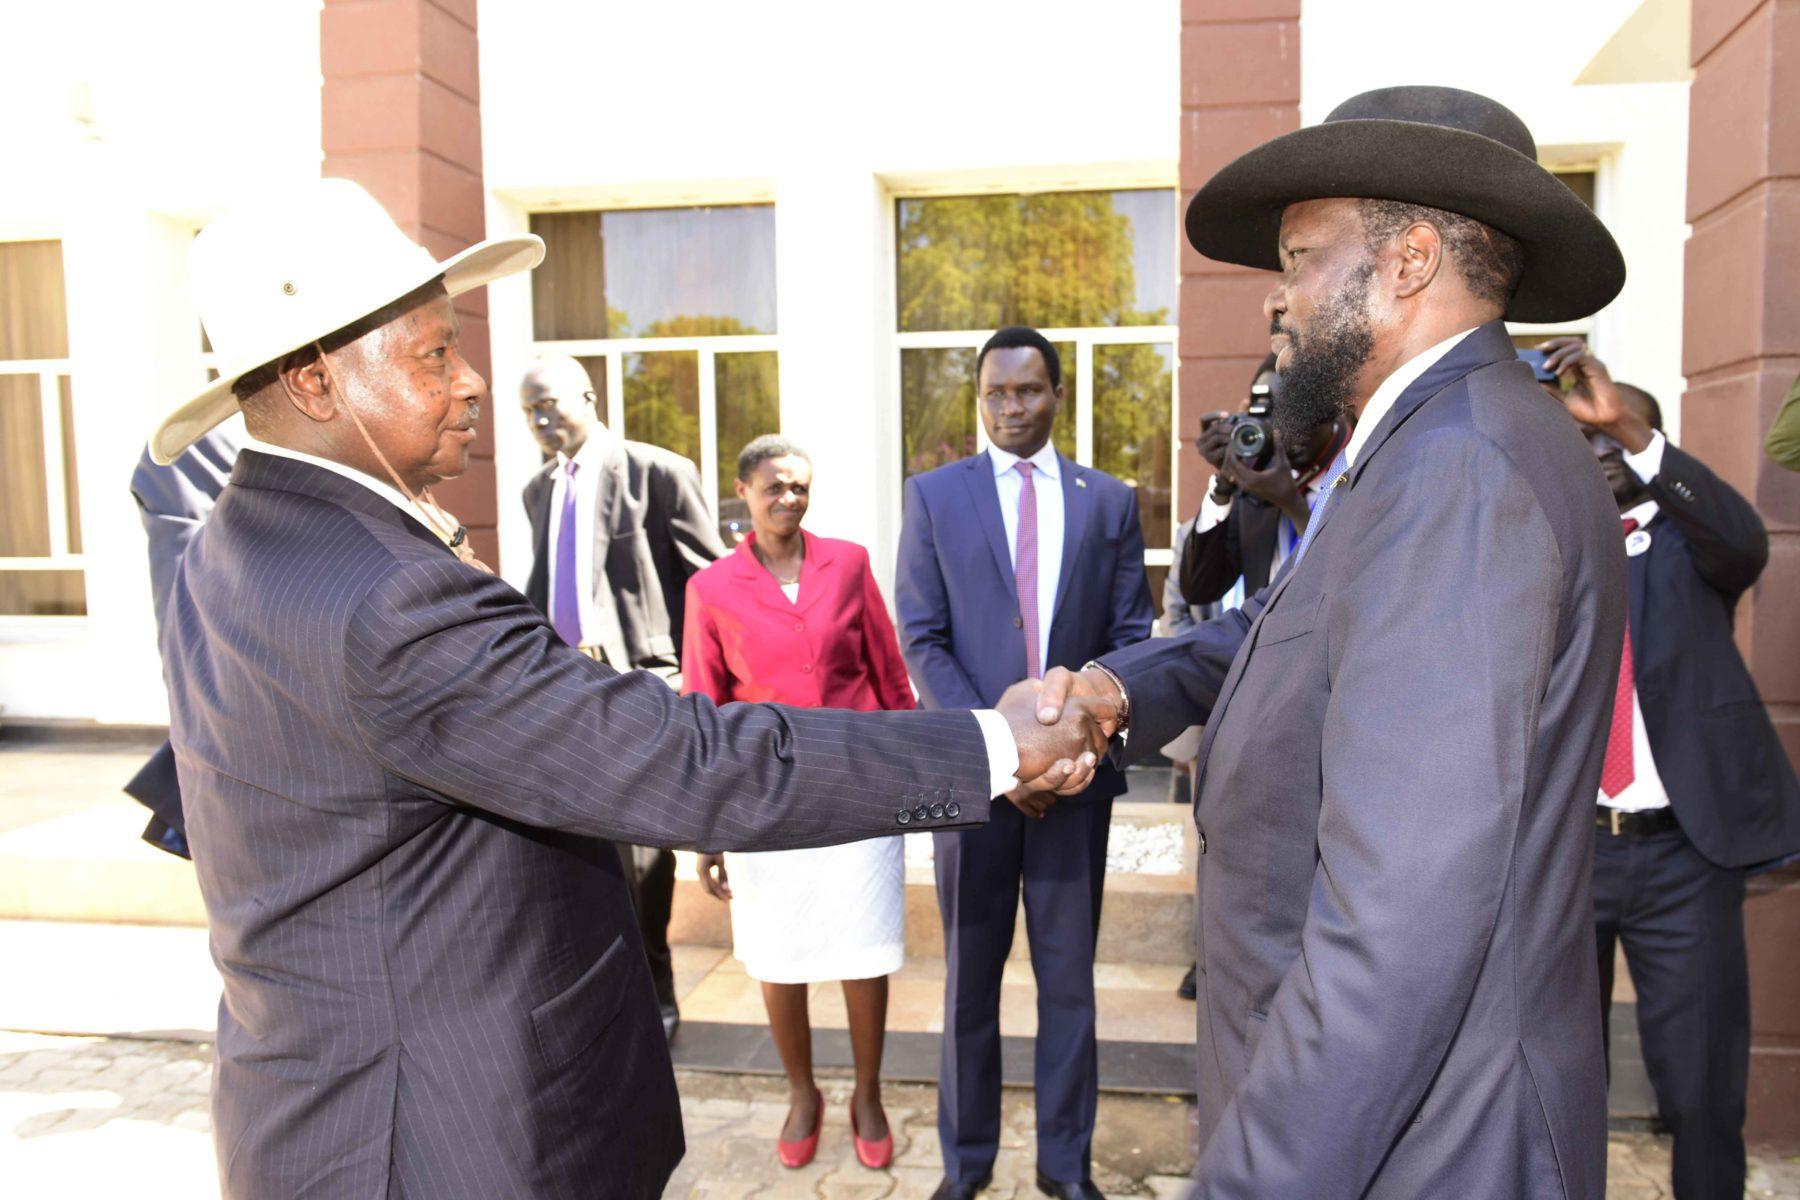 Kiir welcomes Museveni to Juba.